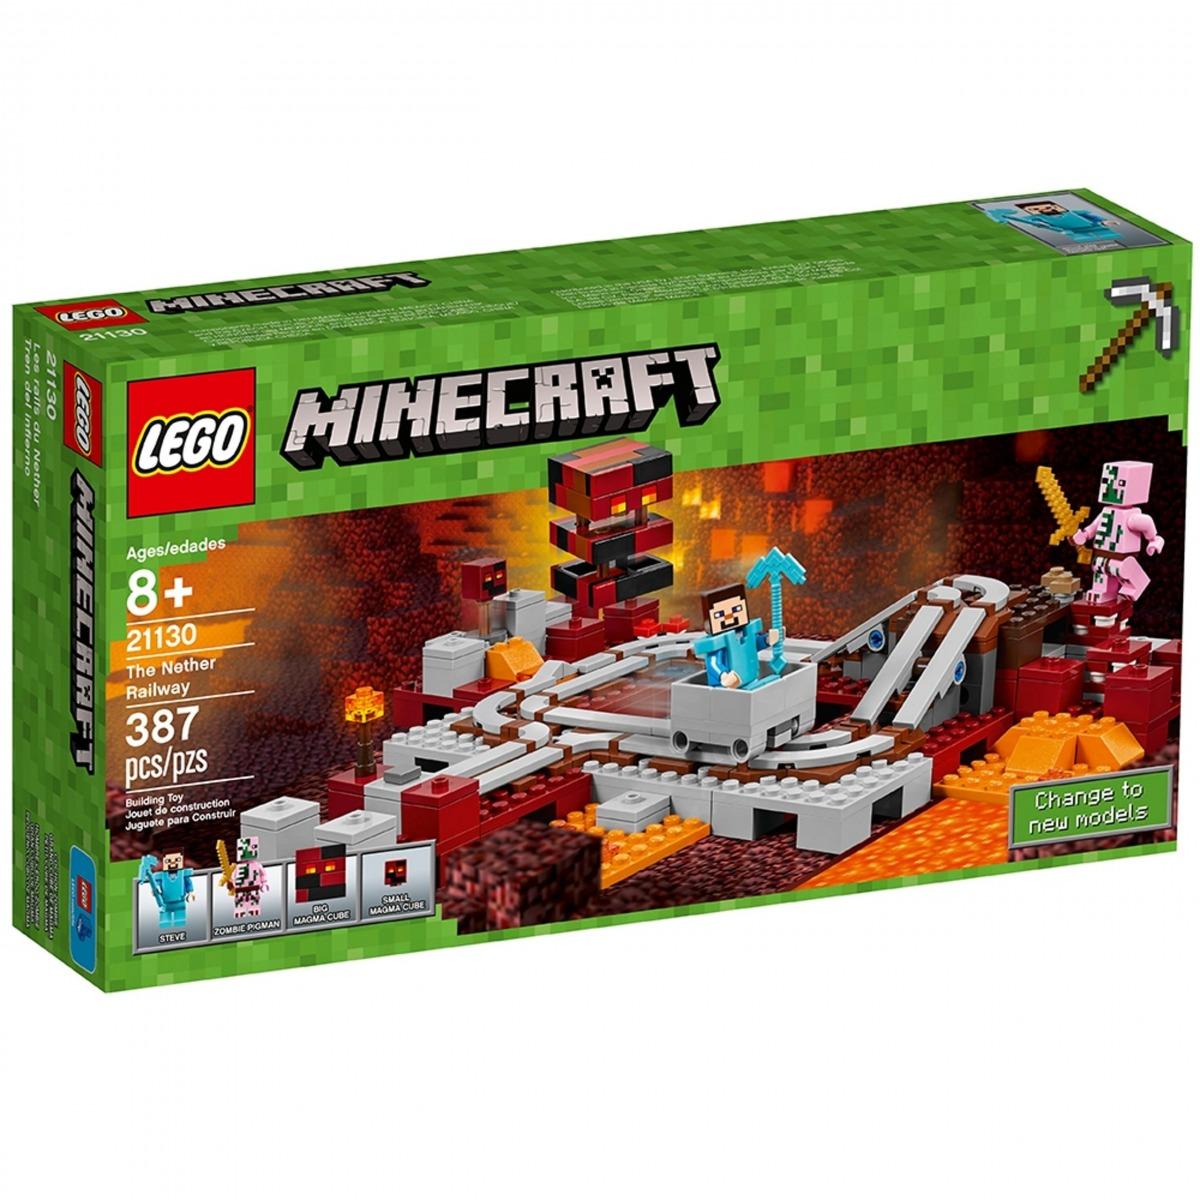 21130 official lego 21130 shop se scaled